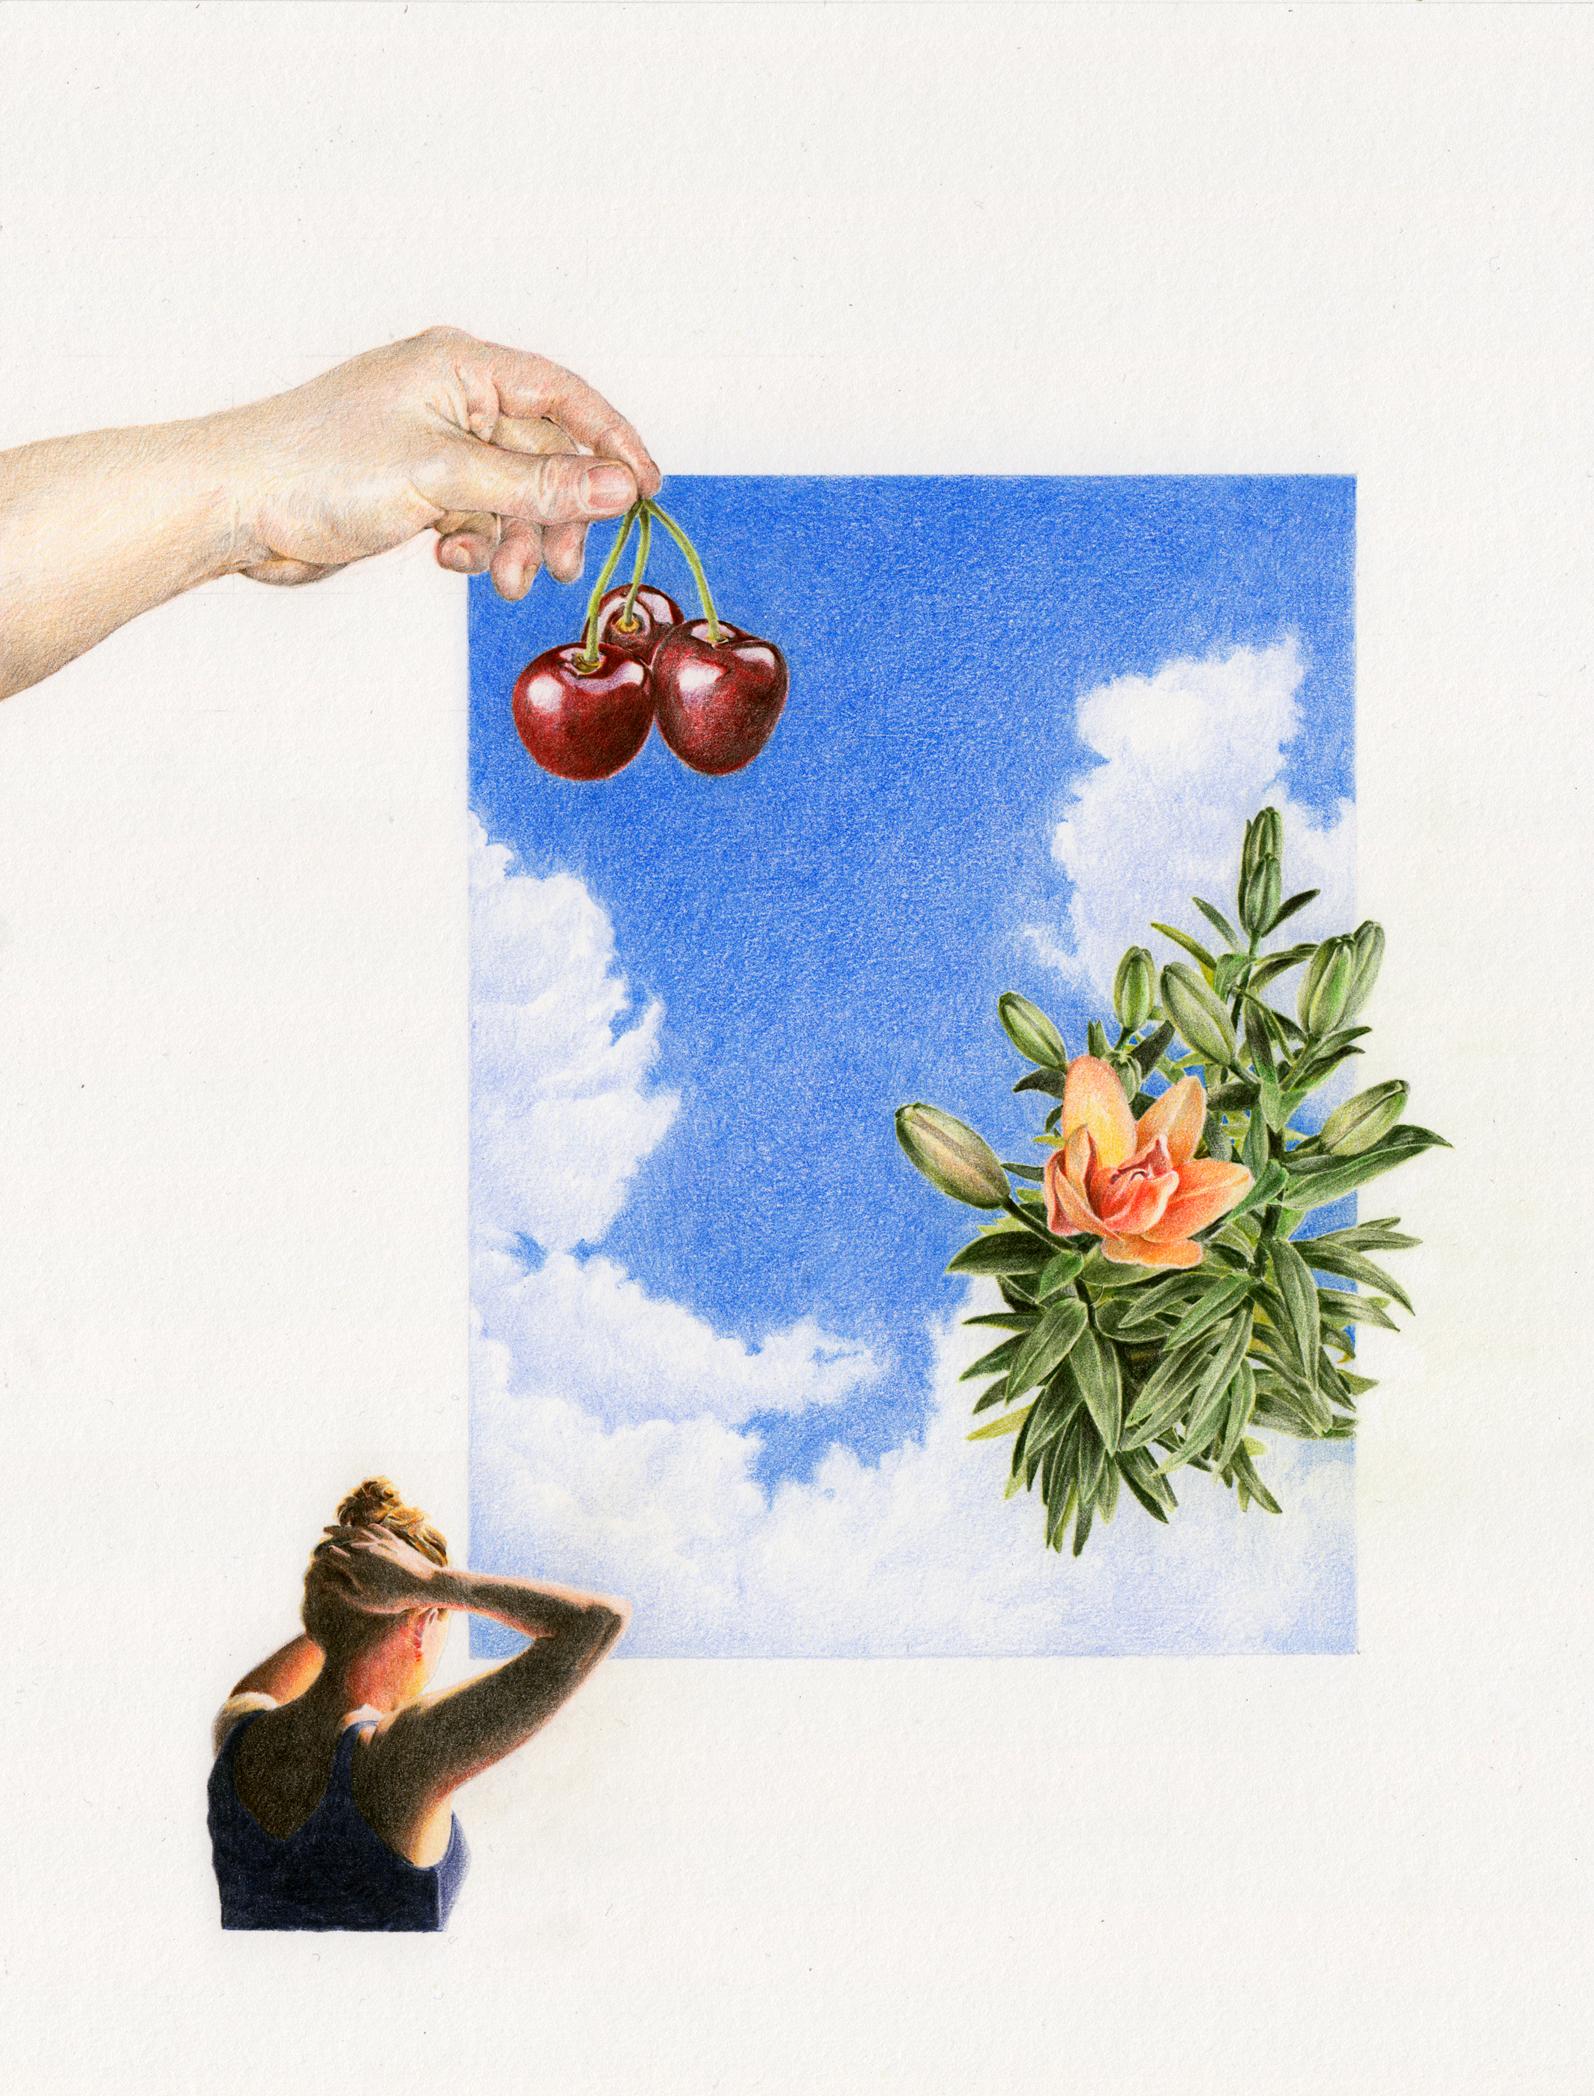 Loveblood Creative- Alexandre Luu -Illustration for Papier Magazine.jpg